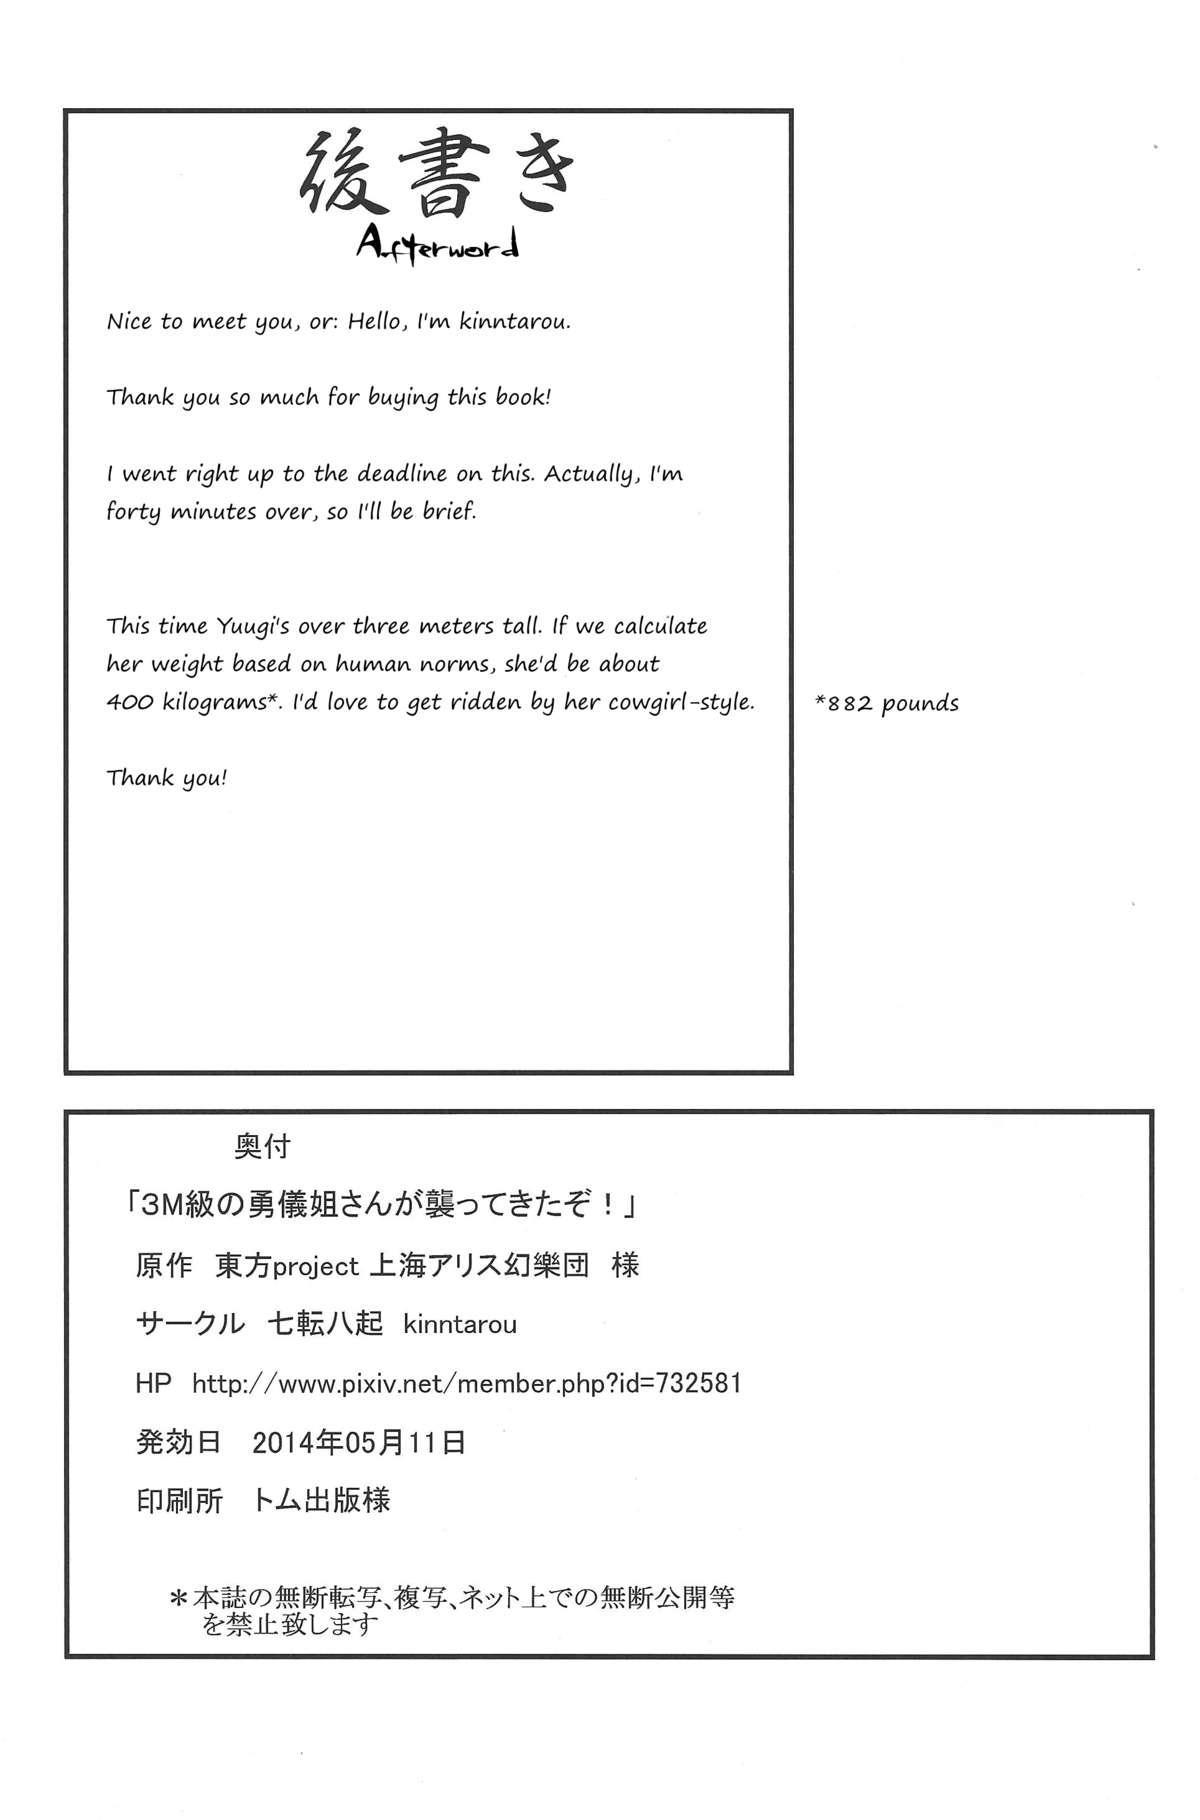 (Reitaisai 11) [Nanakorobi Yaoki (kinntarou)] 3M-Kyuu no Yuugi Nee-san ga Osotte Kitazo! | Attack of the 3M-Class Yuugi! (Touhou Project) [English] {JUSTICE} 24